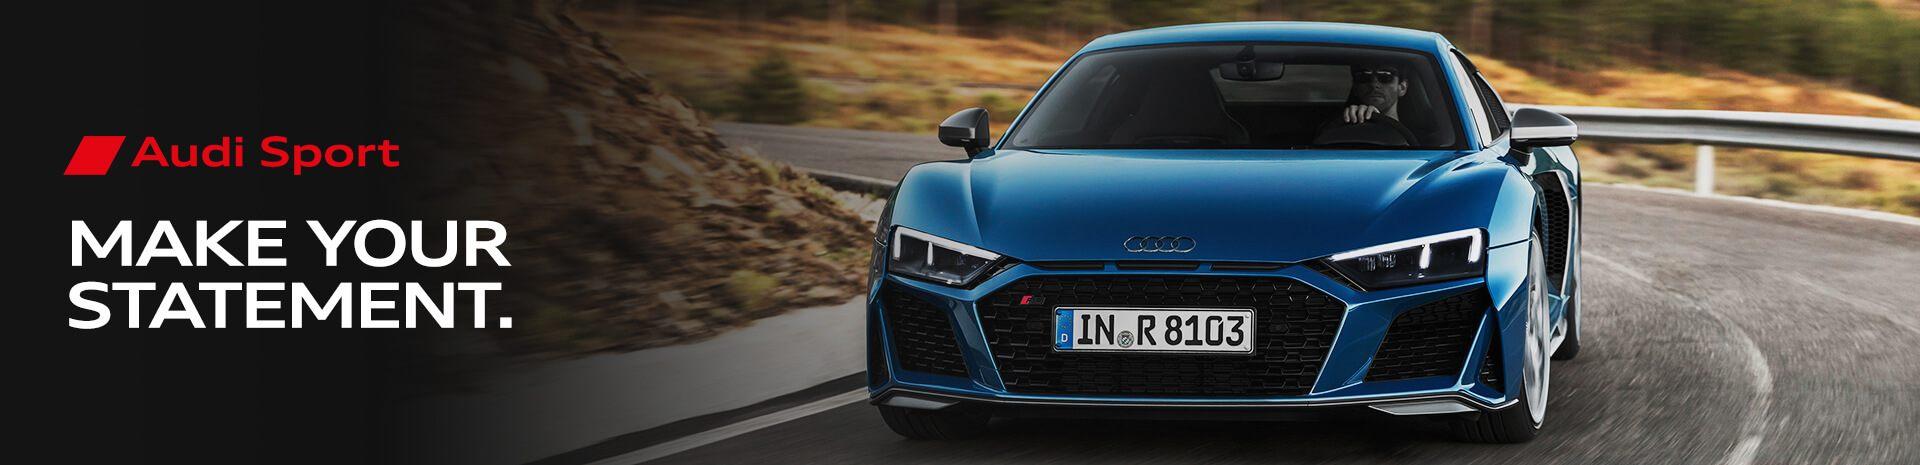 Audi Sports Banner